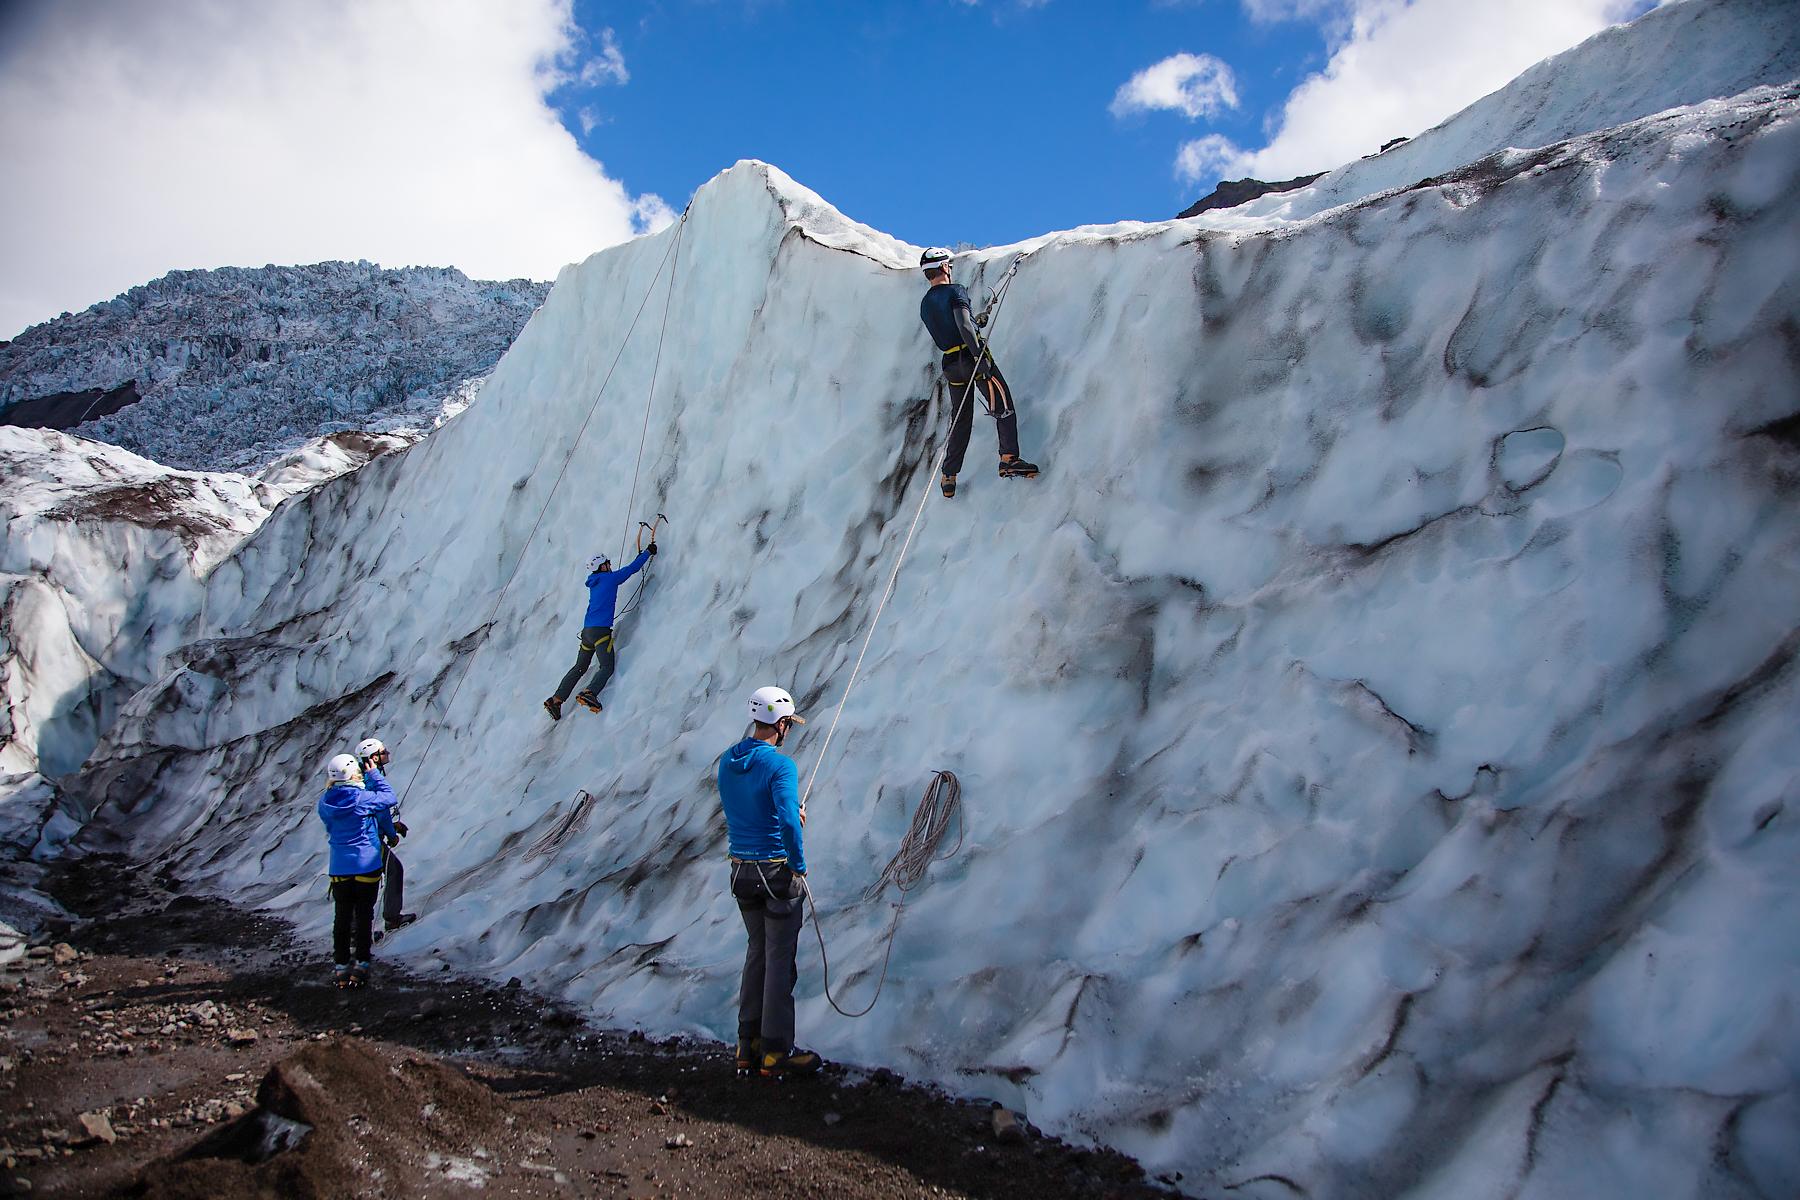 glaciericeclimbingiceland4.jpg